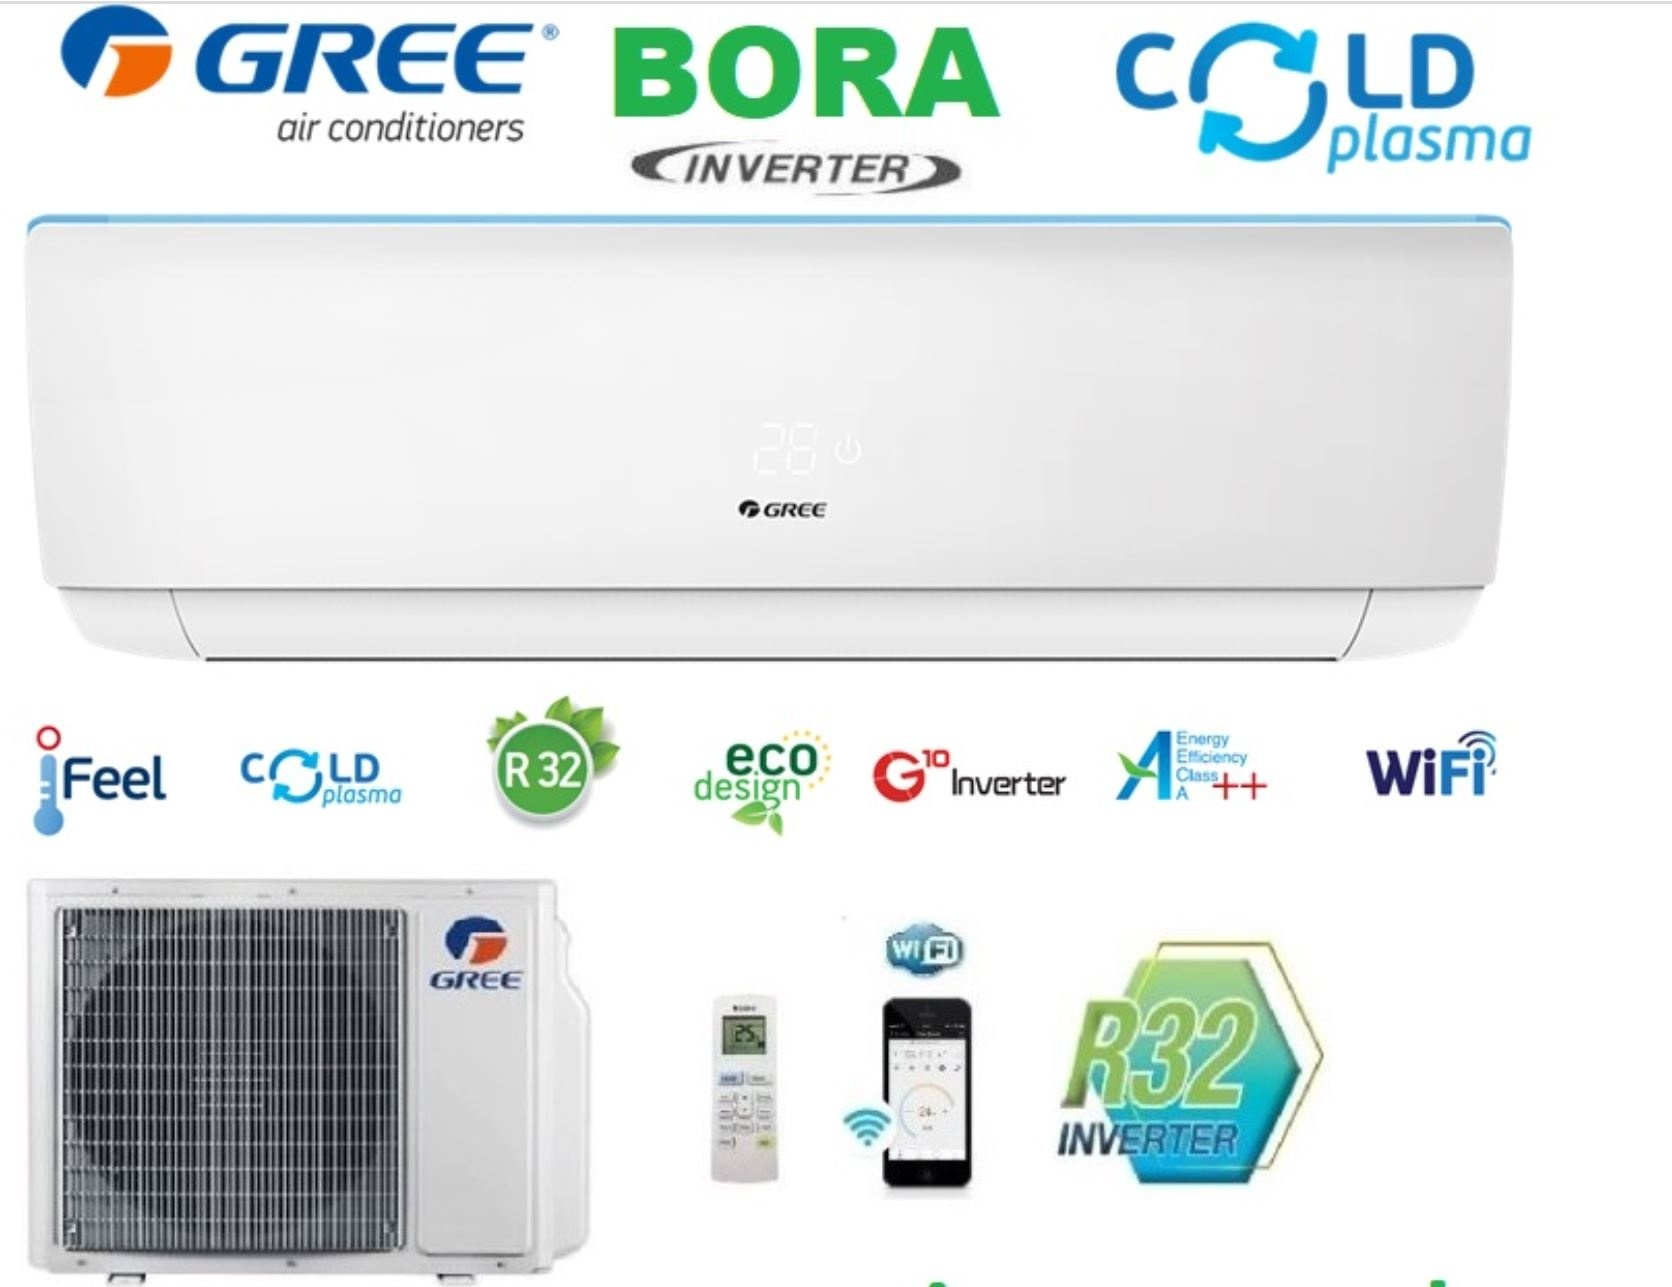 Bora GREE BORA A++ , Wifi , inverter 5kw 18000btu